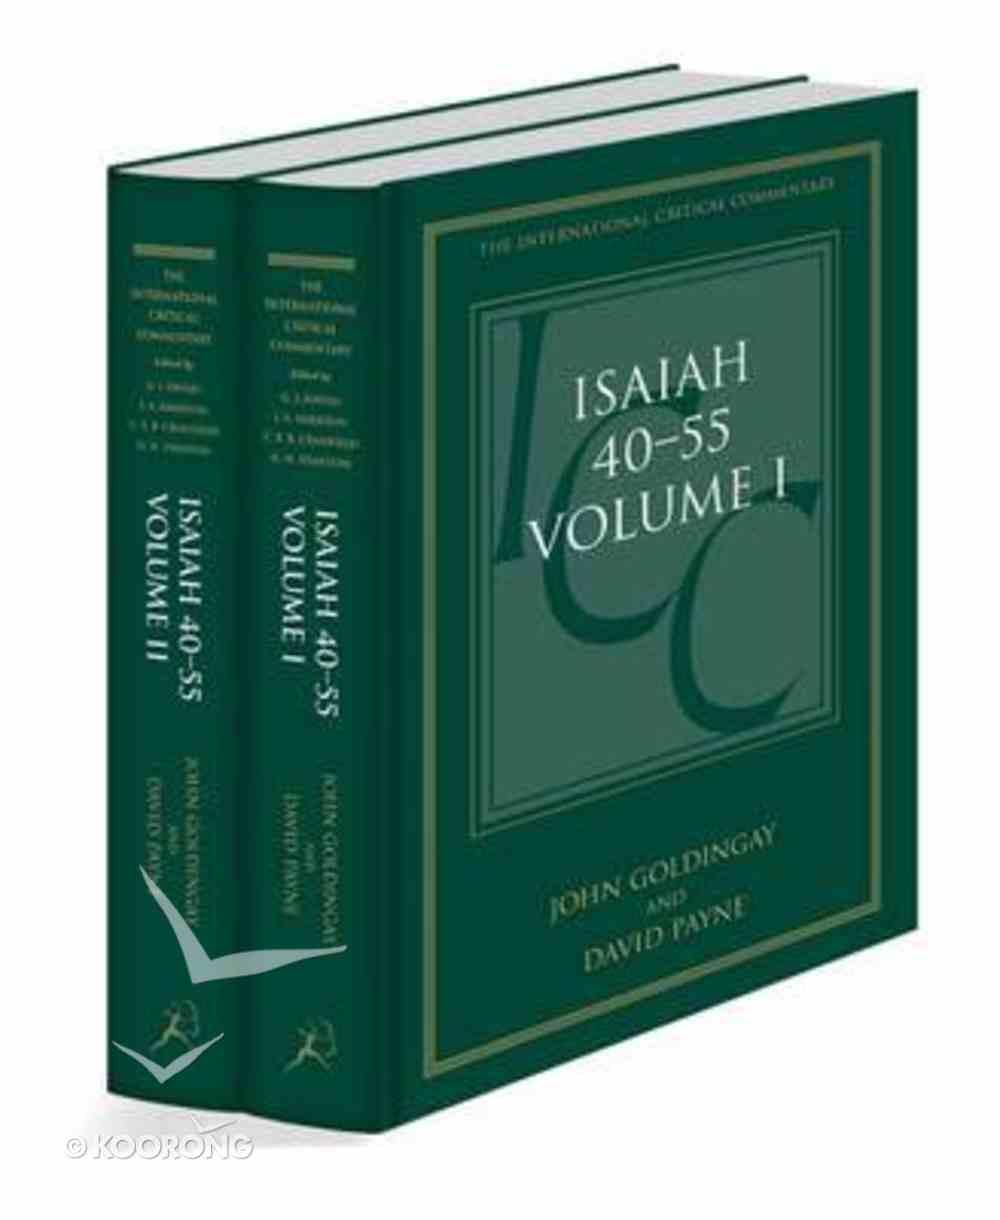 Isaiah 40-55 (Volume 1 & 2) (International Critical Commentary Series) Hardback